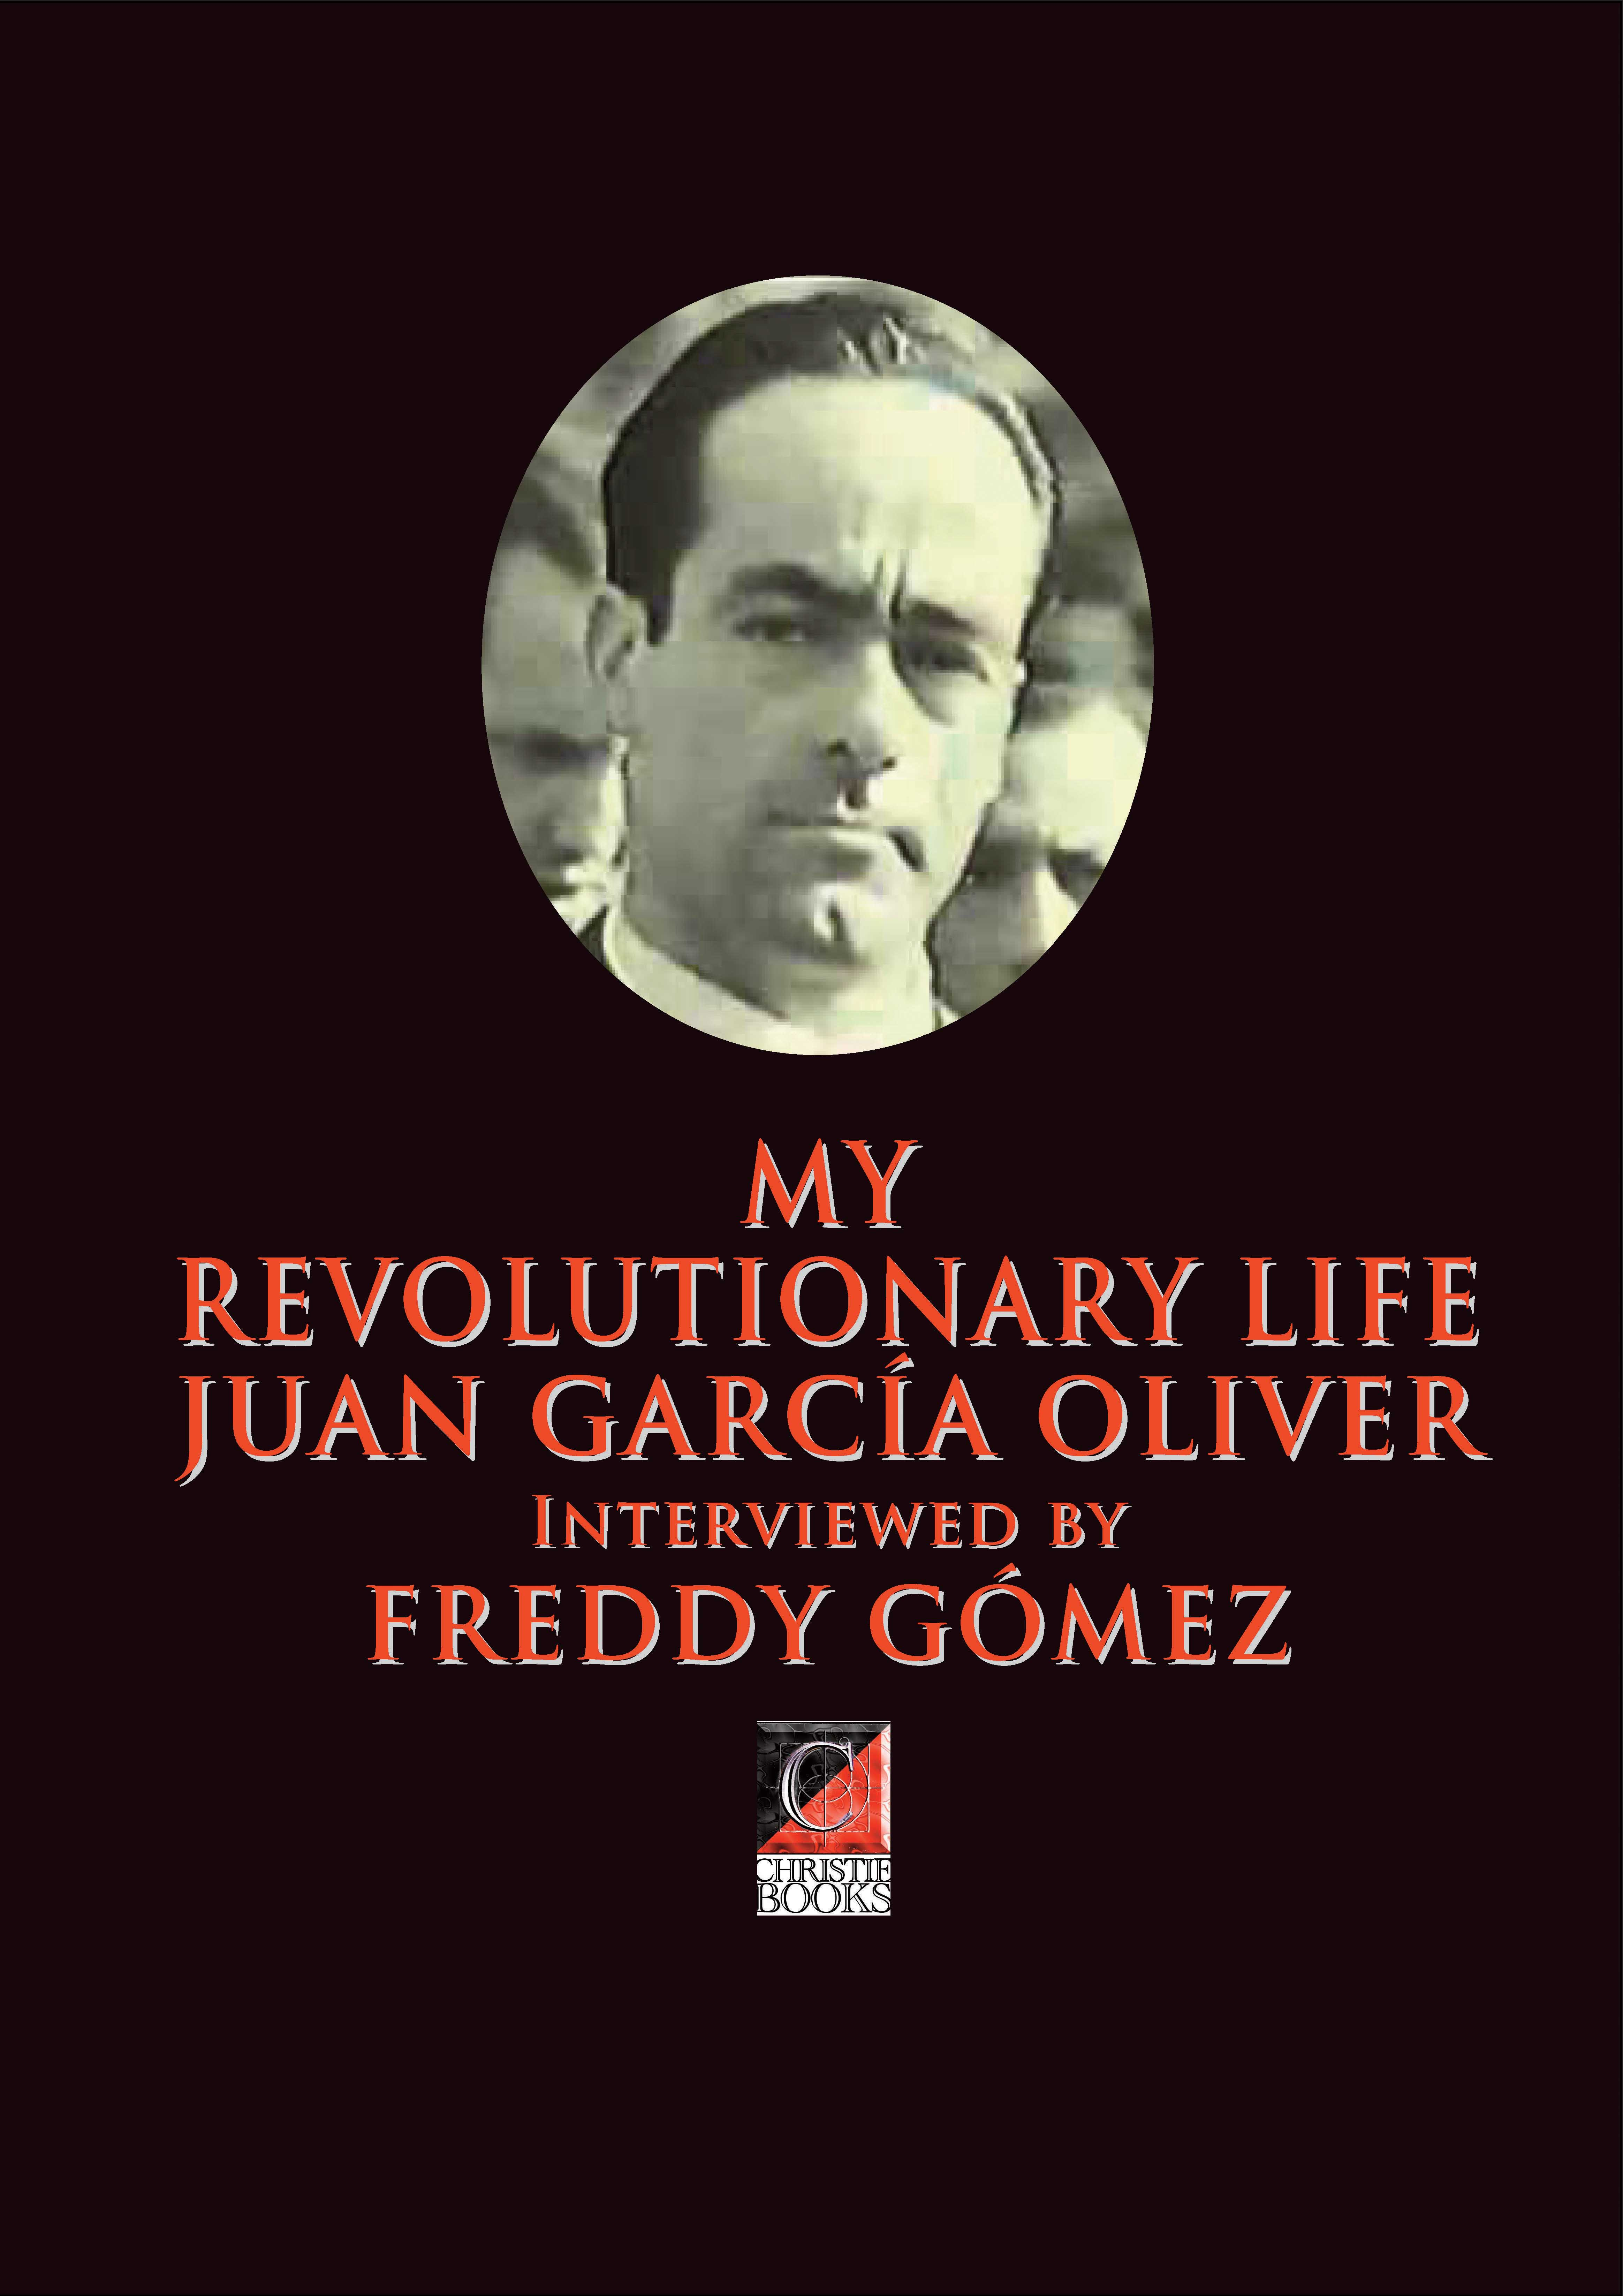 MY REVOLUTIONARY LIFE JUAN GARCÍA OLIVER Interviewed by FREDDY GÓMEZ